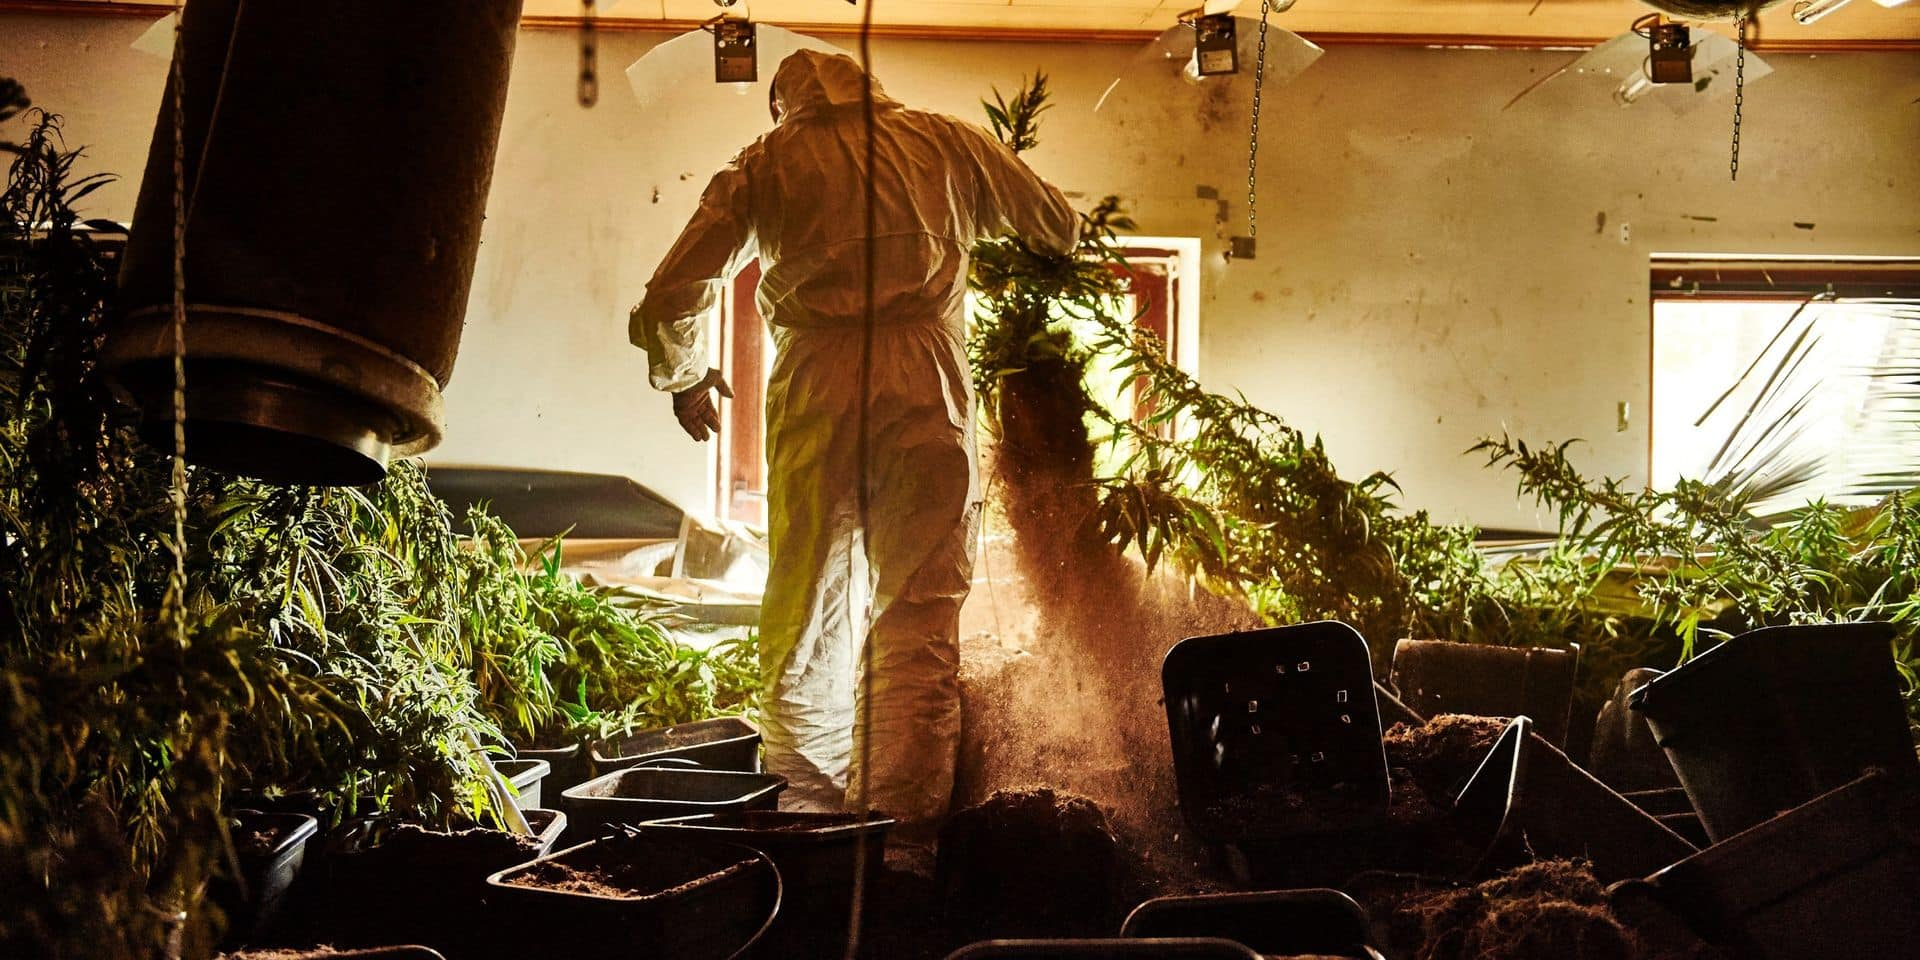 Plantation de cannabis : saisie record à Grâce-Hollogne !